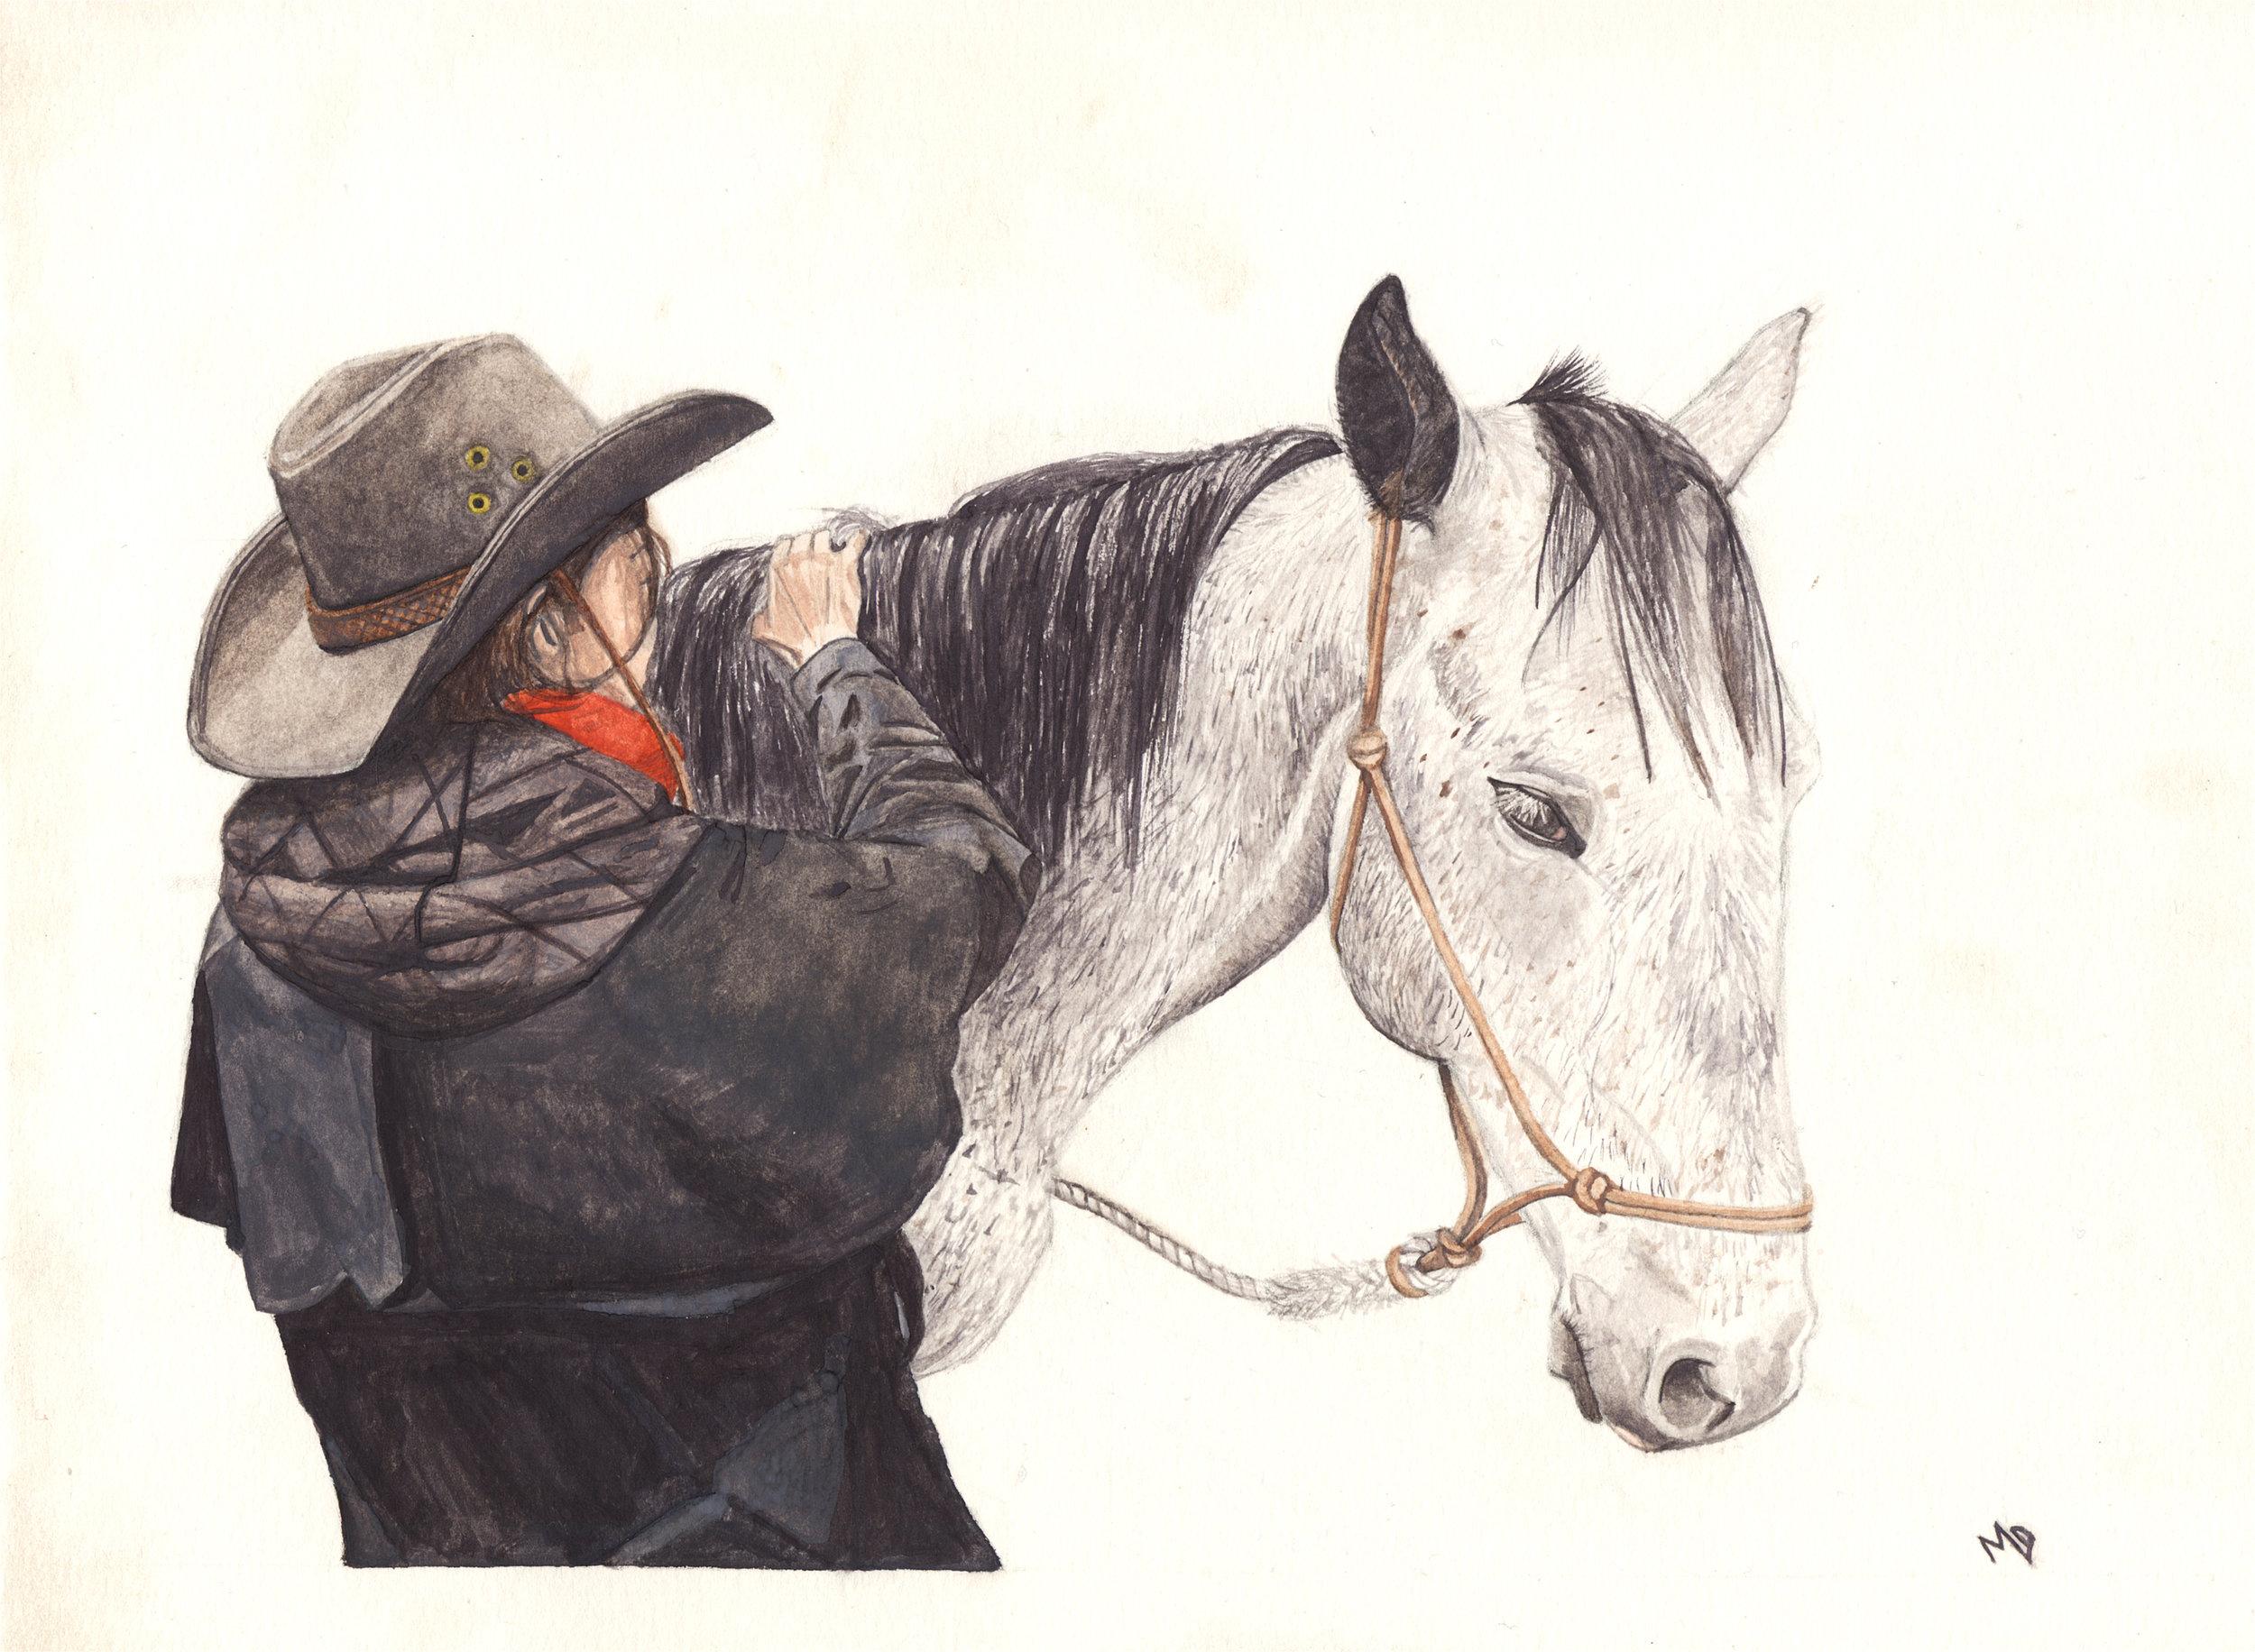 Eva (no. 1) | 8 x 10 inches | watercolor on paper | sold